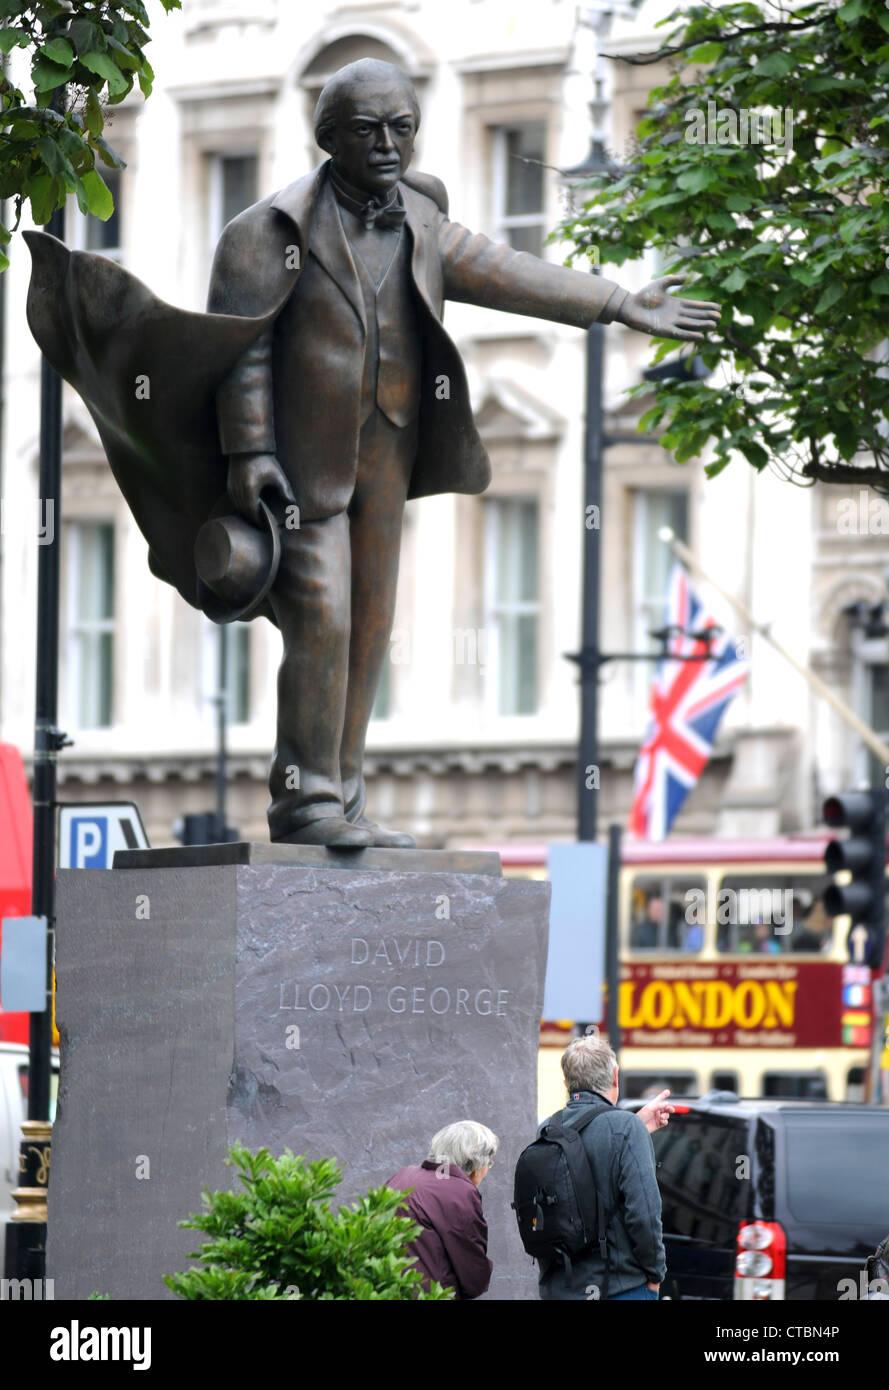 David Lloyd George statue, Prime Minister David Lloyd George, London, Britain, UK - Stock Image